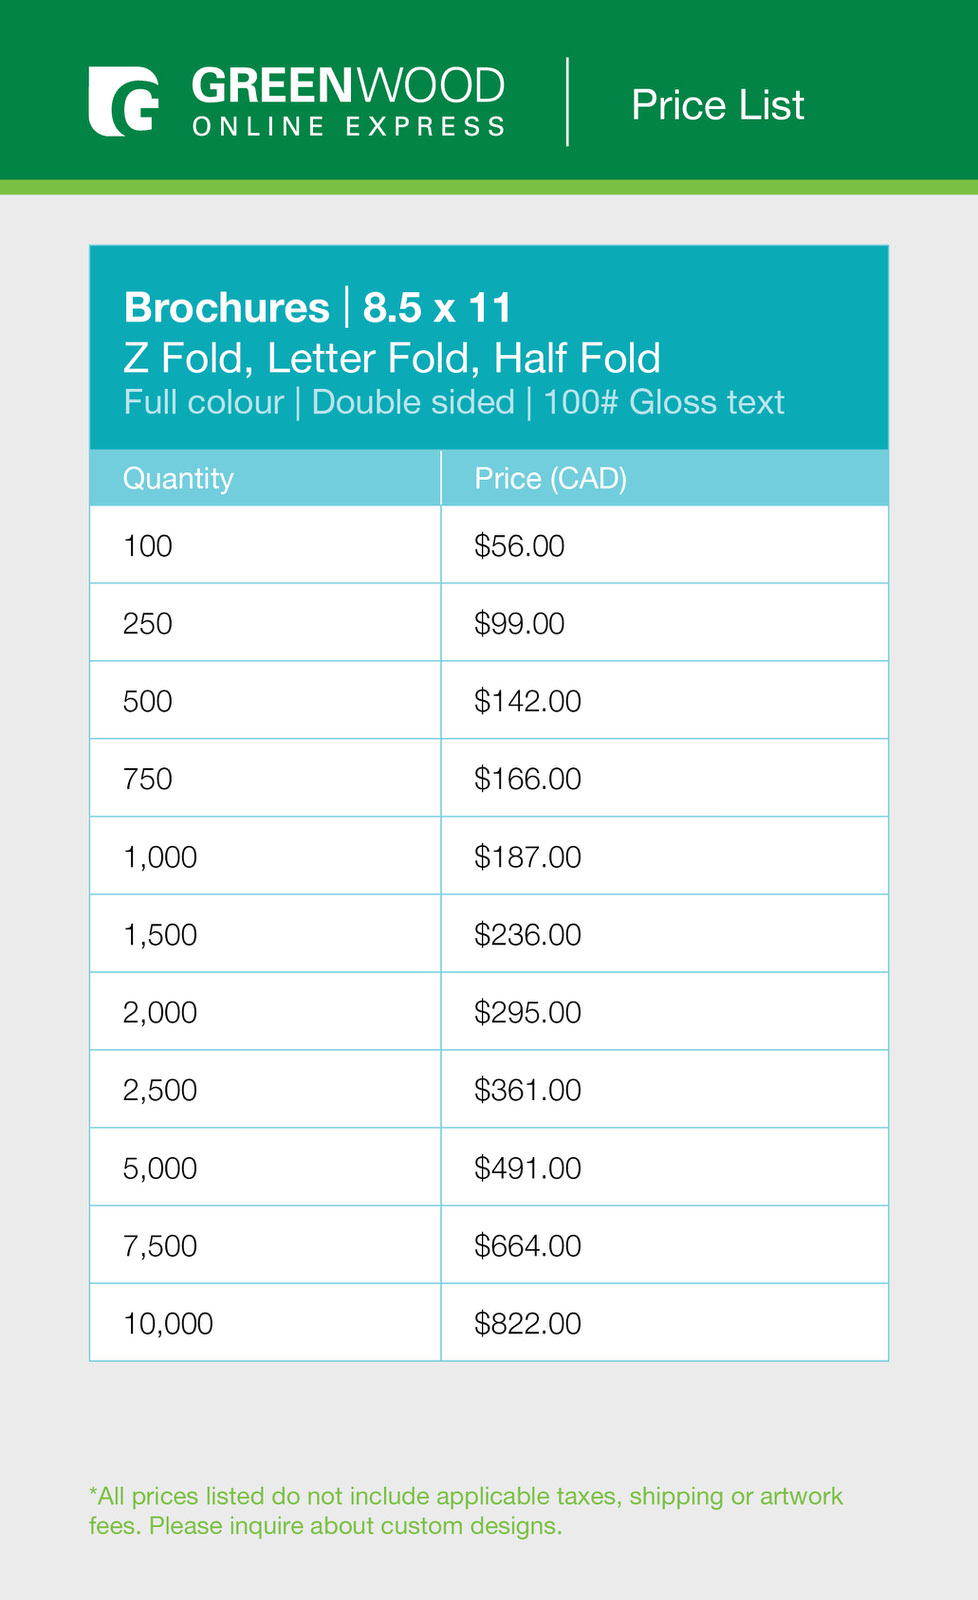 Greenwood brochure colour price list.jpg